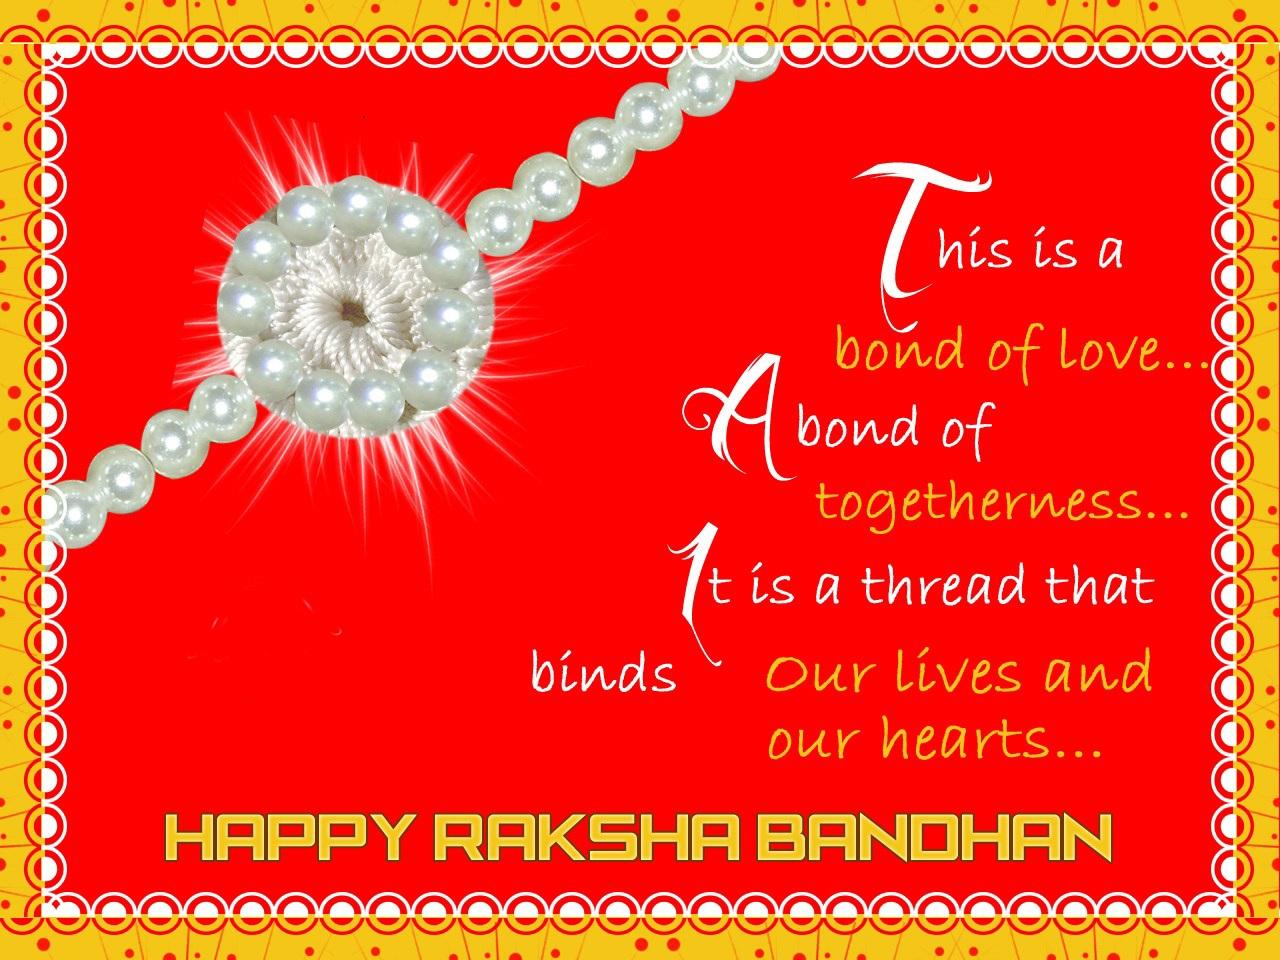 Best Happy Raksha Bandhan Images And Quotes